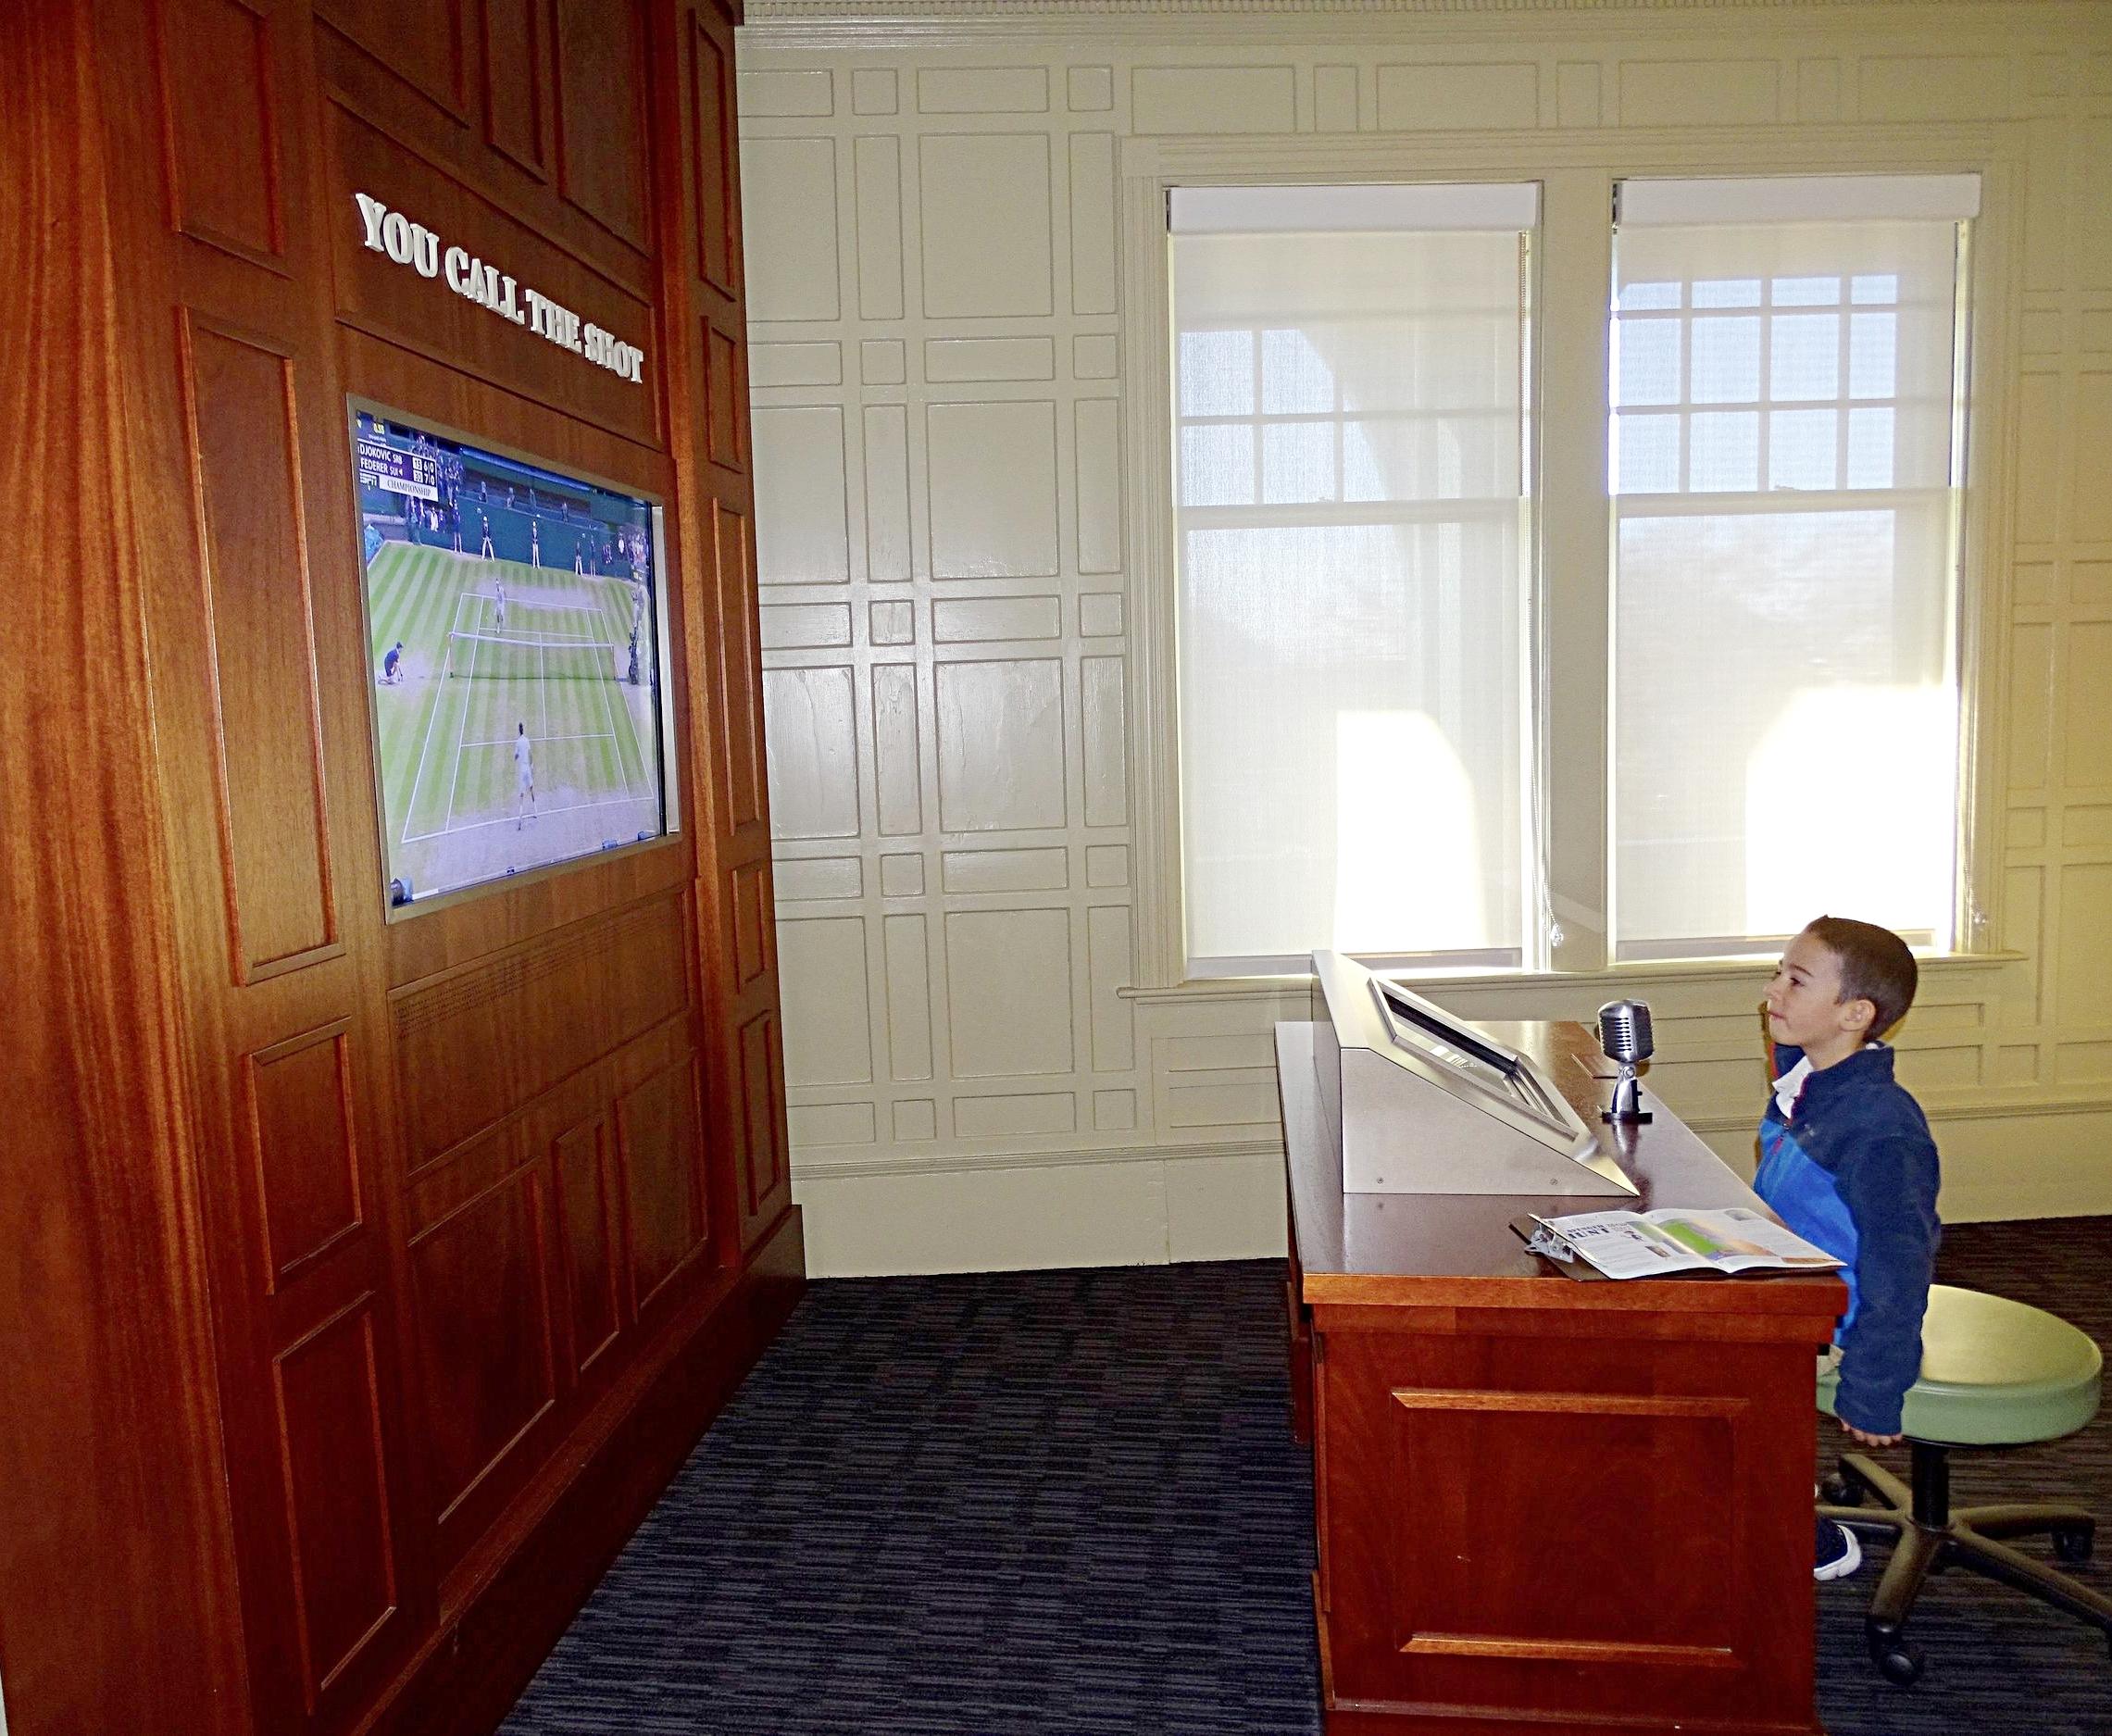 My son, channeling his inner Pat McEnroe broadcasting skills.